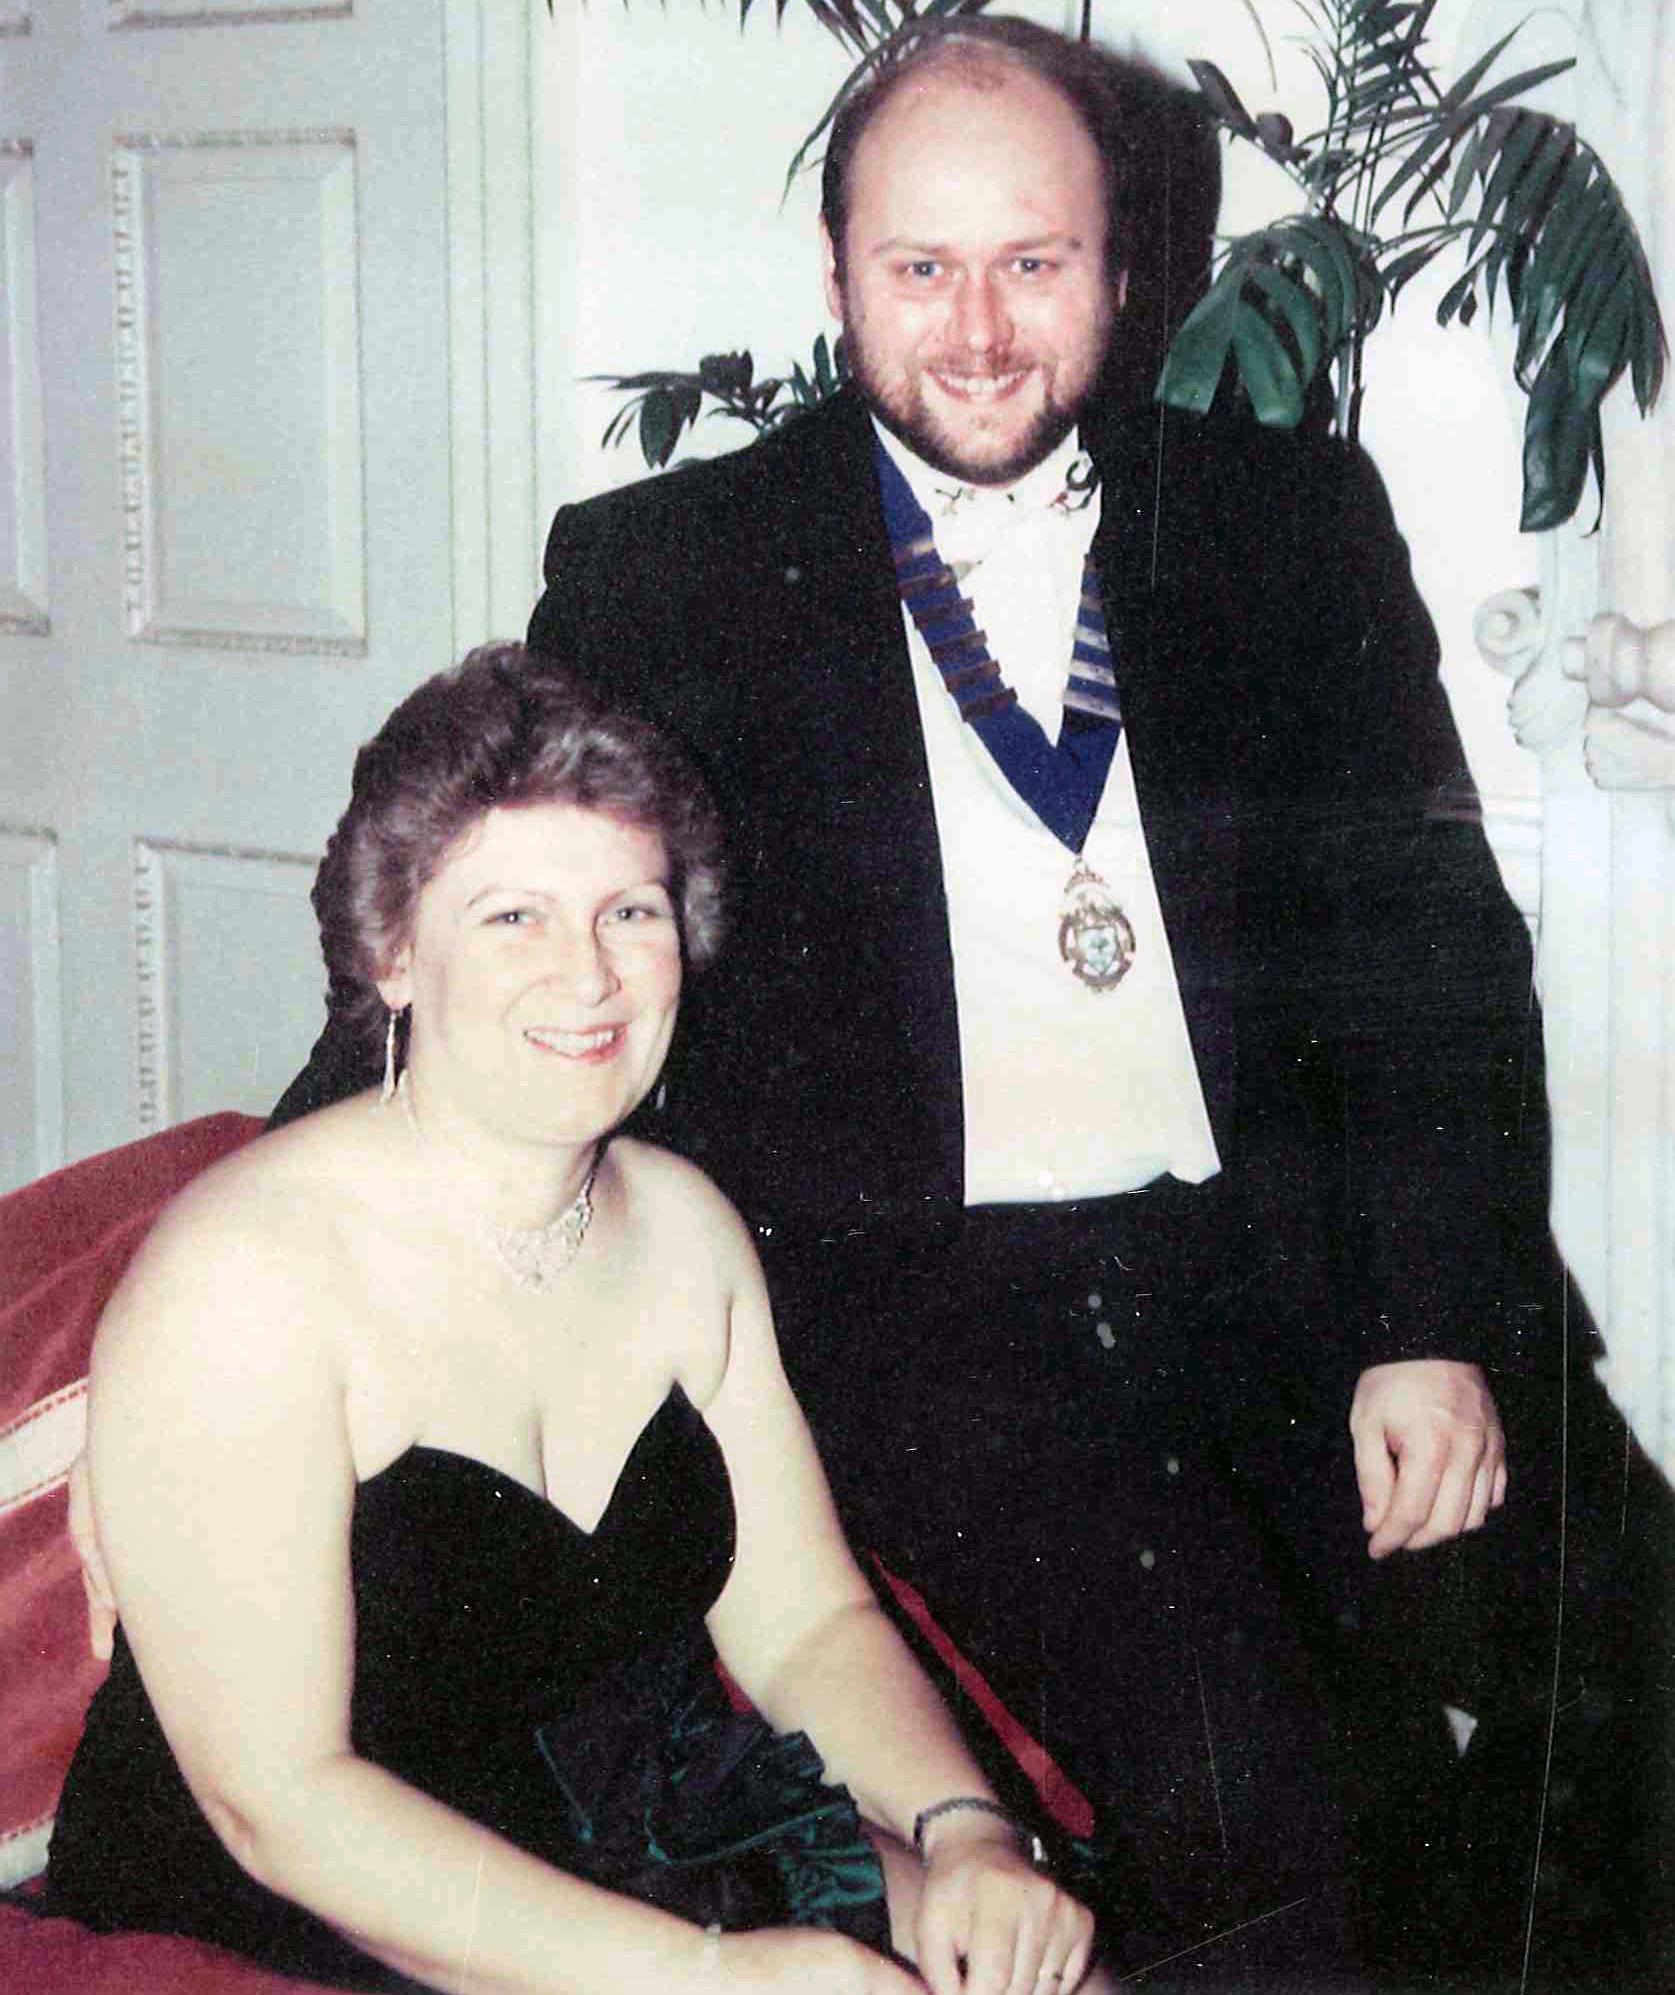 julia-chris-lawson-chamber-dinner-1991